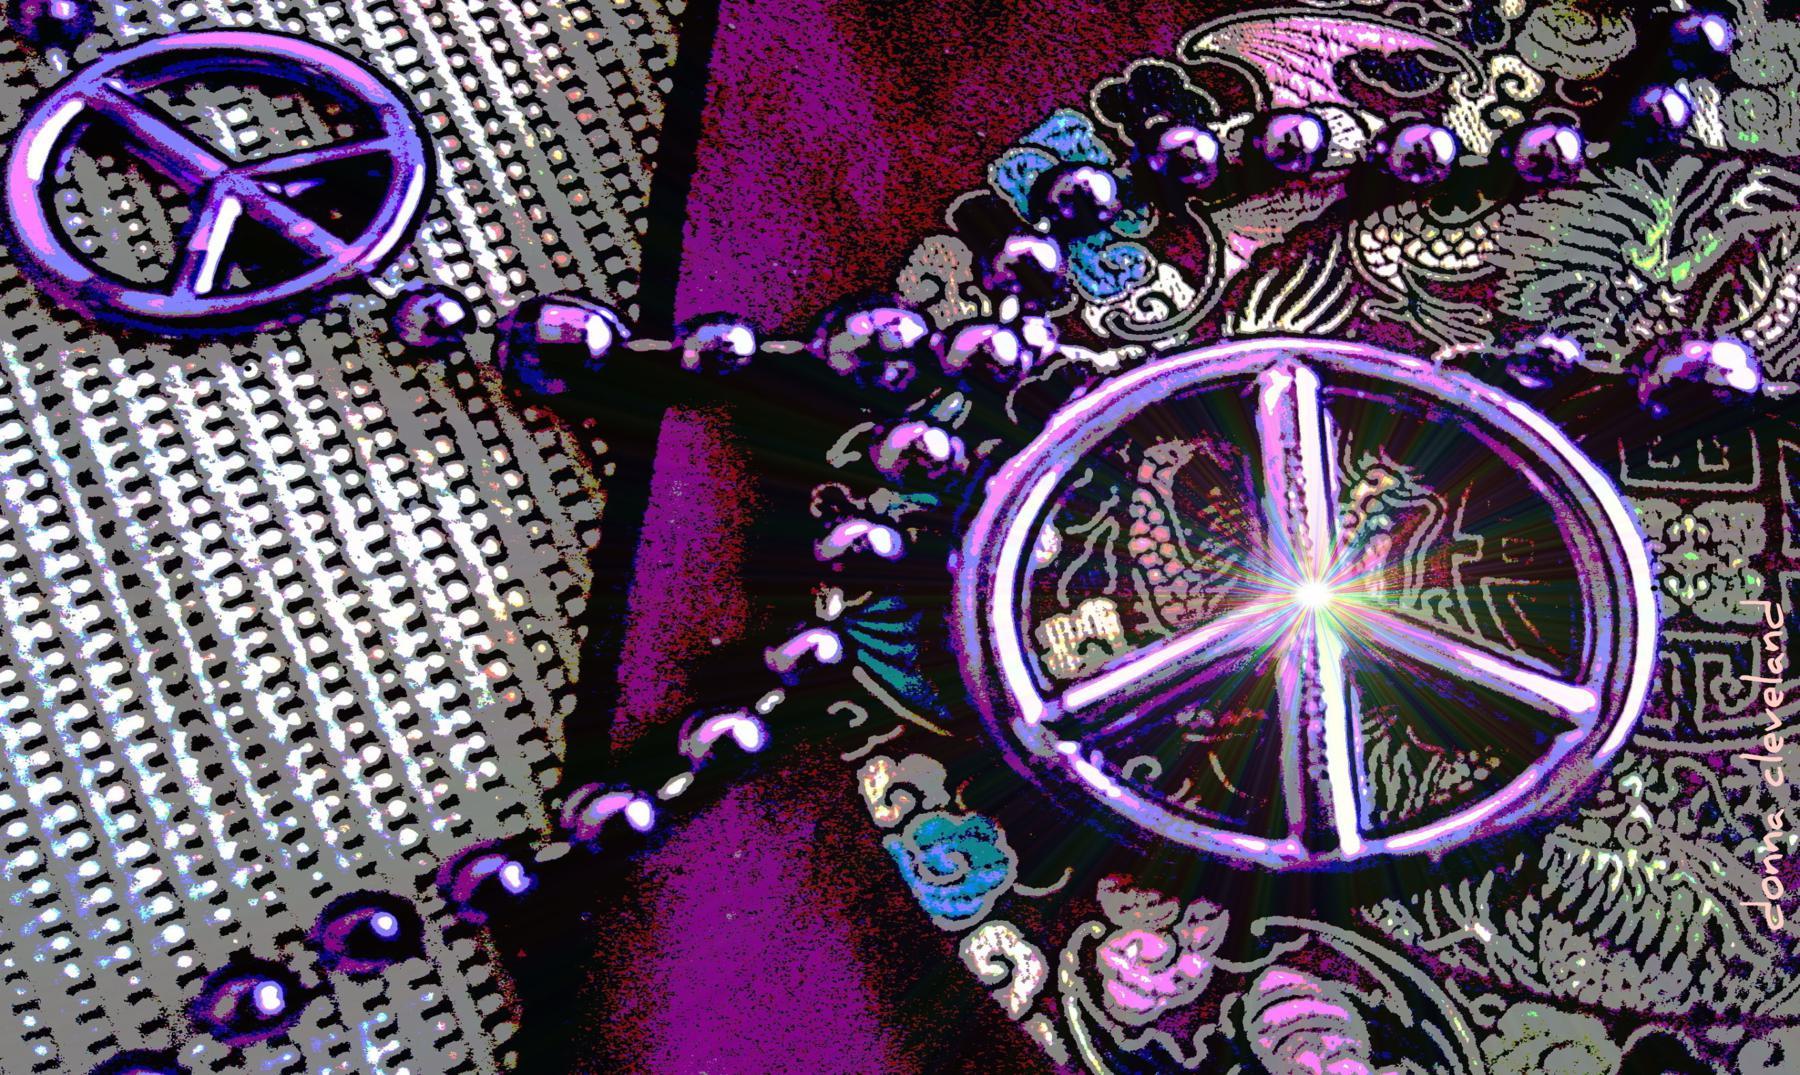 ¿Cuál es el origen del símbolo de la paz de 1958?